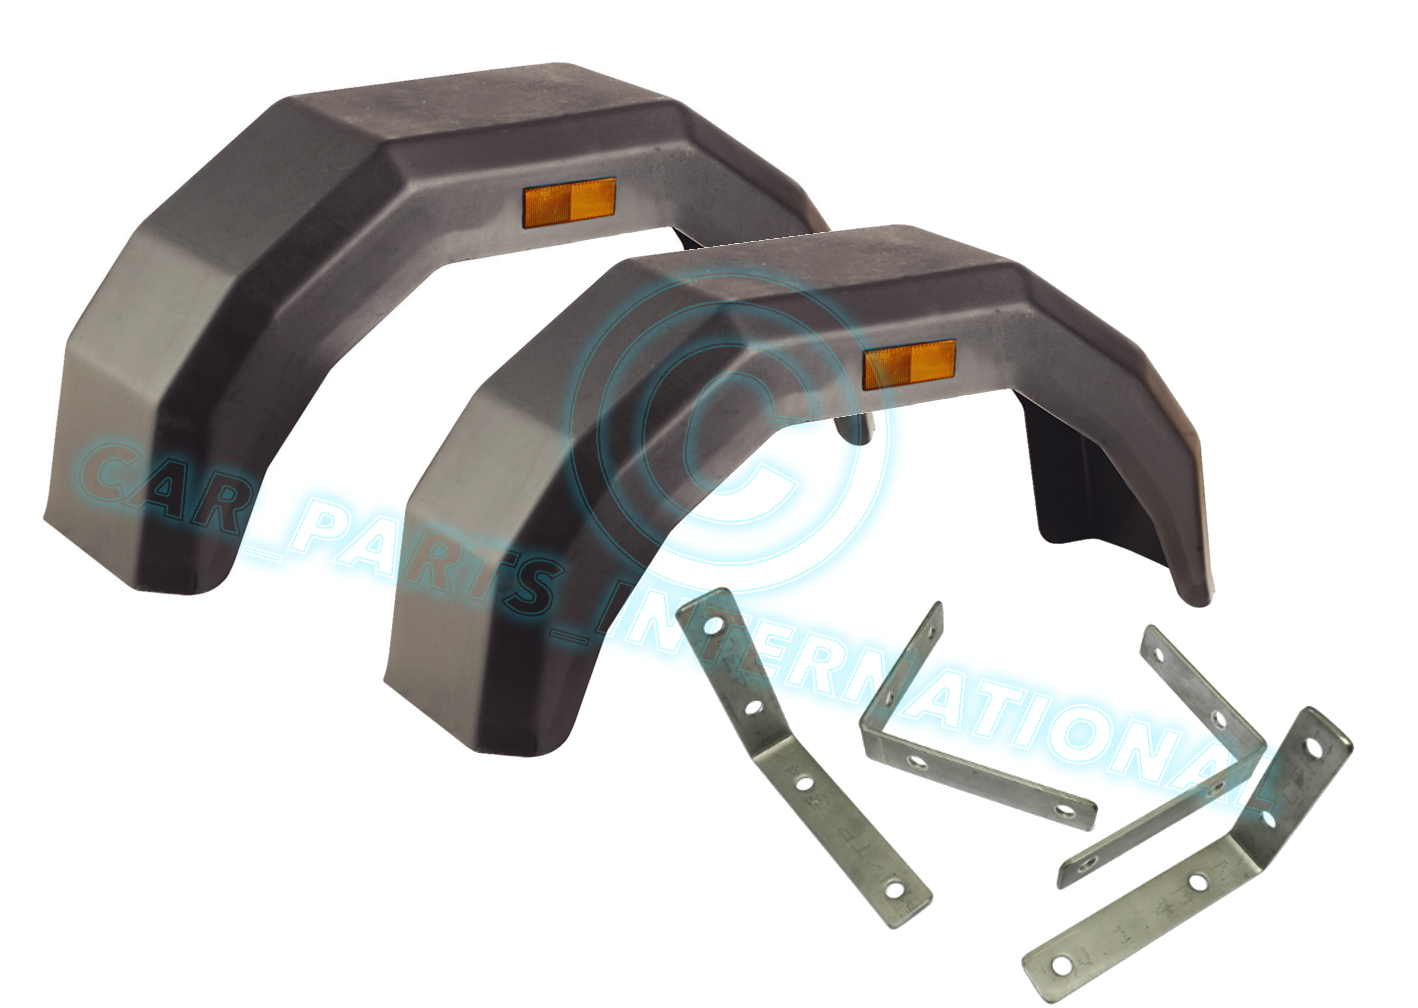 2 X Plastic Mudguard Arch Mud Guard Large Trailer Wheel Reflectors Amp Brackets Ebay